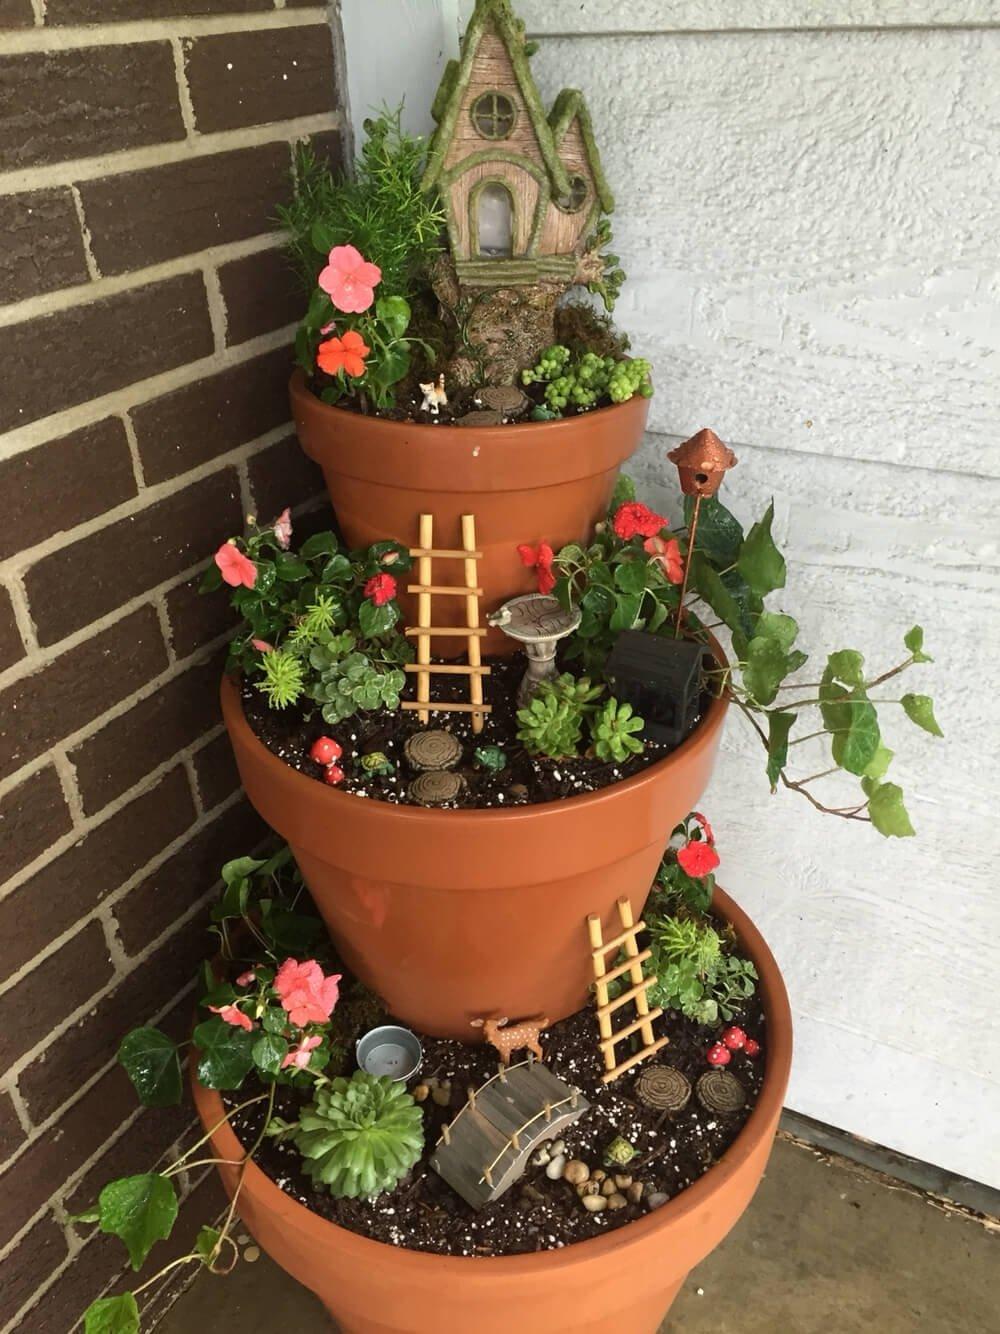 10 Fashionable Flower Pot Ideas For Front Porch 29 best front door flower pots ideas and designs for 2018 5 2021